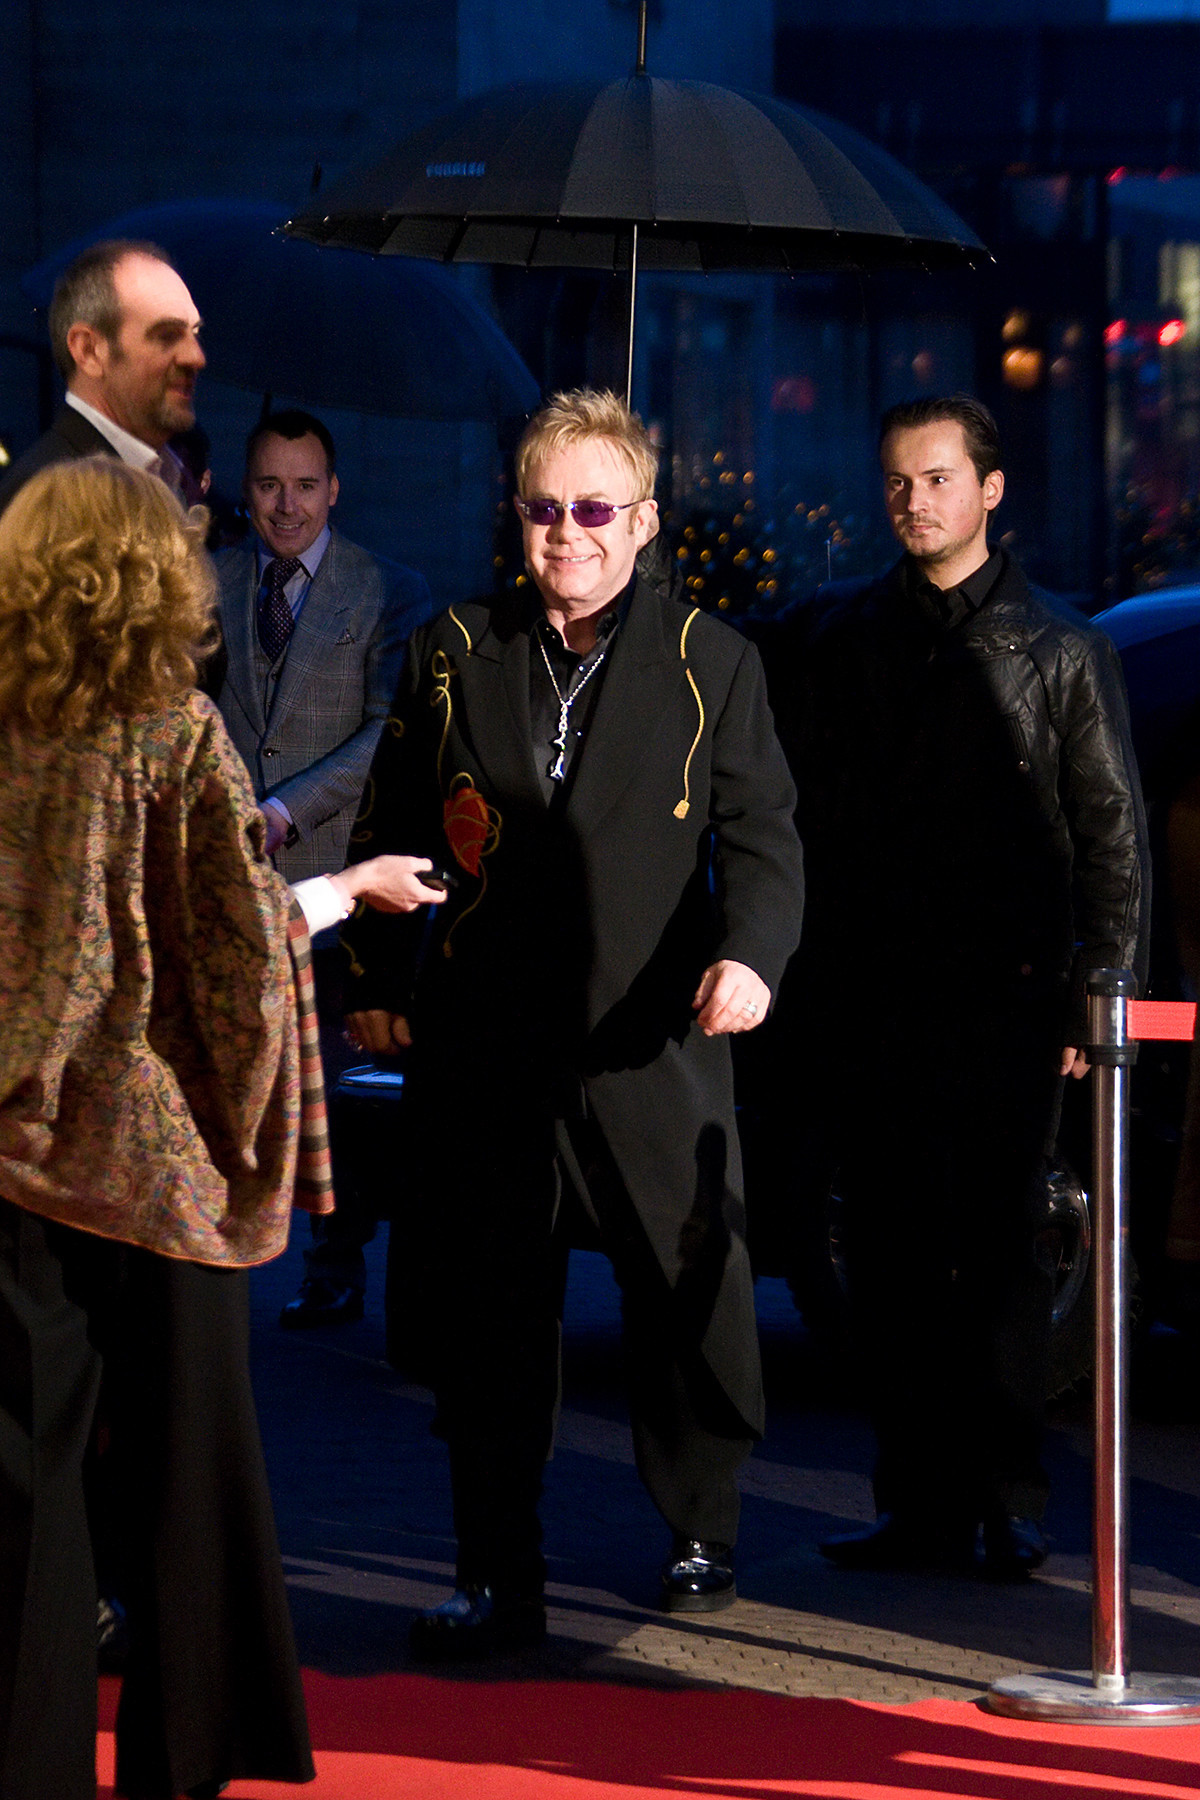 Britanski pevec Elton John pred koncertom v Barviha Luxury Village